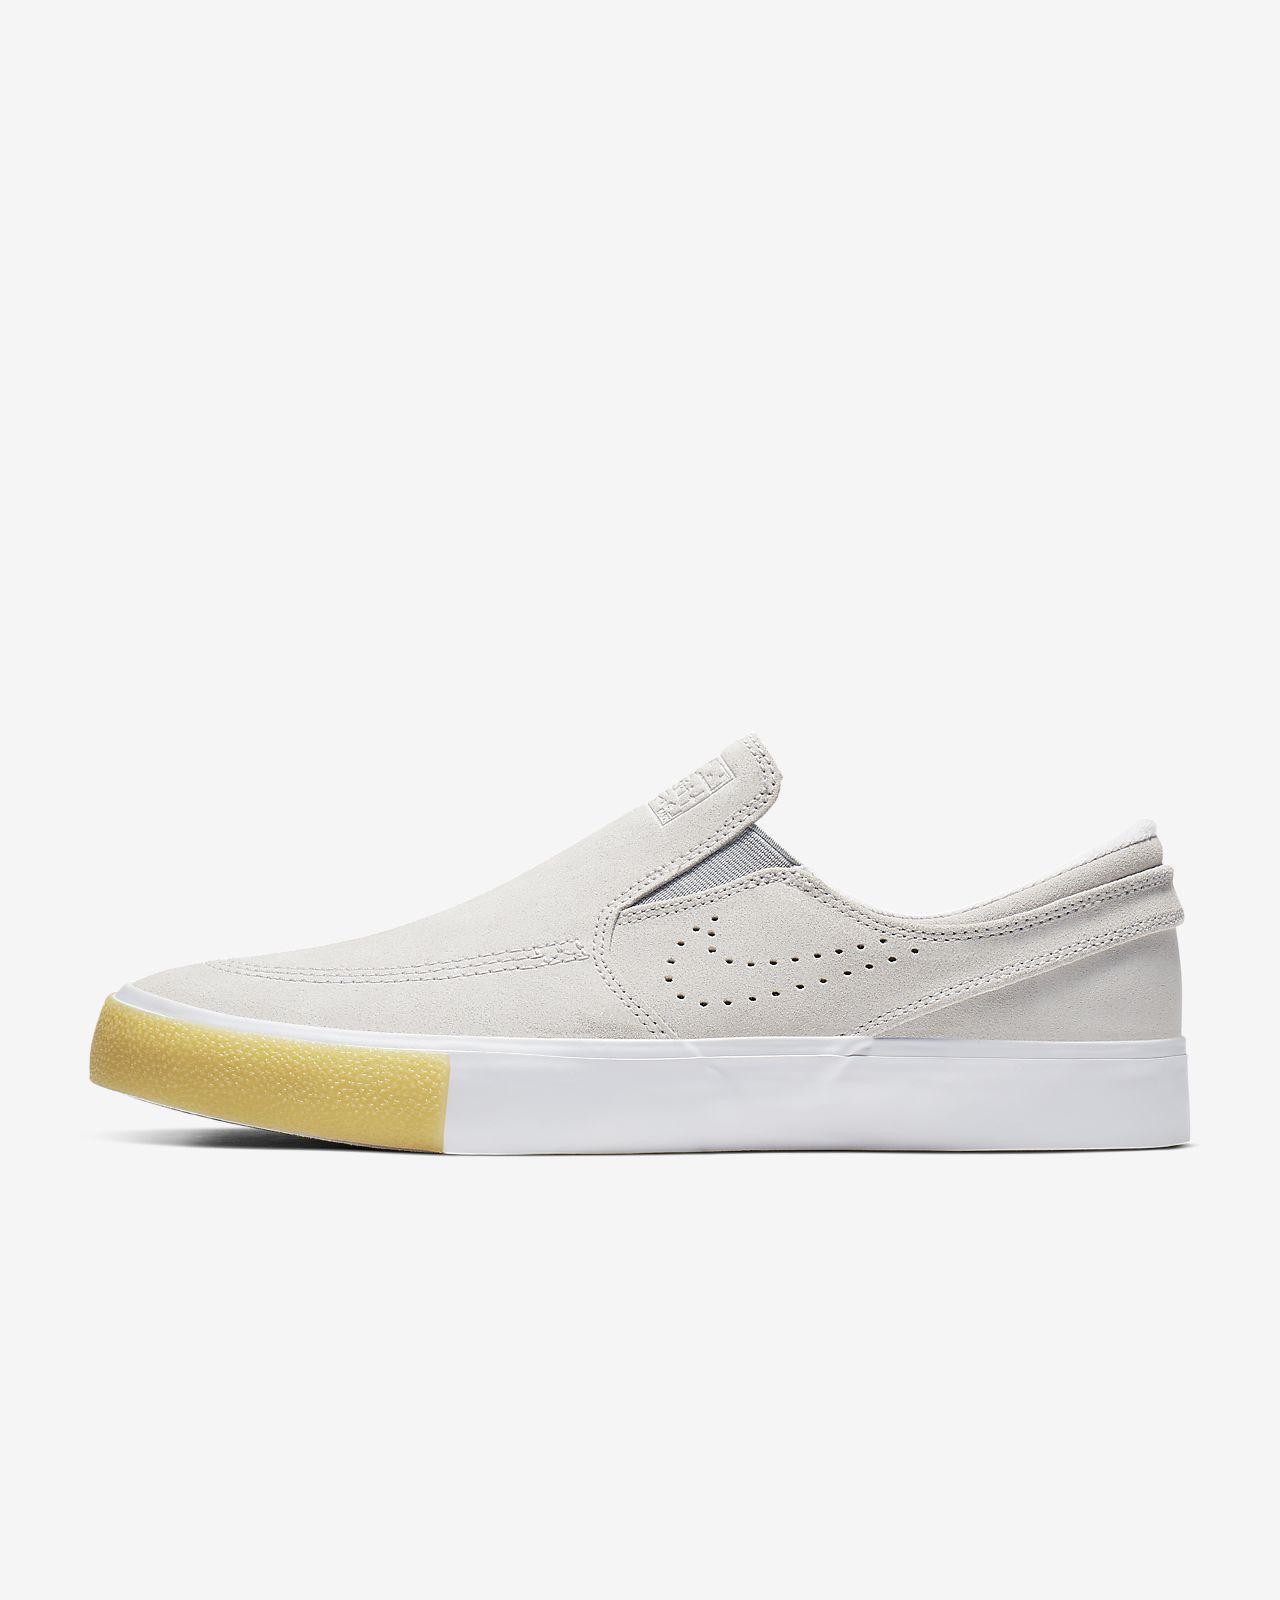 cff8e4ec9e ... Sapatilhas de skateboard Nike SB Zoom Stefan Janoski Slip RM SE